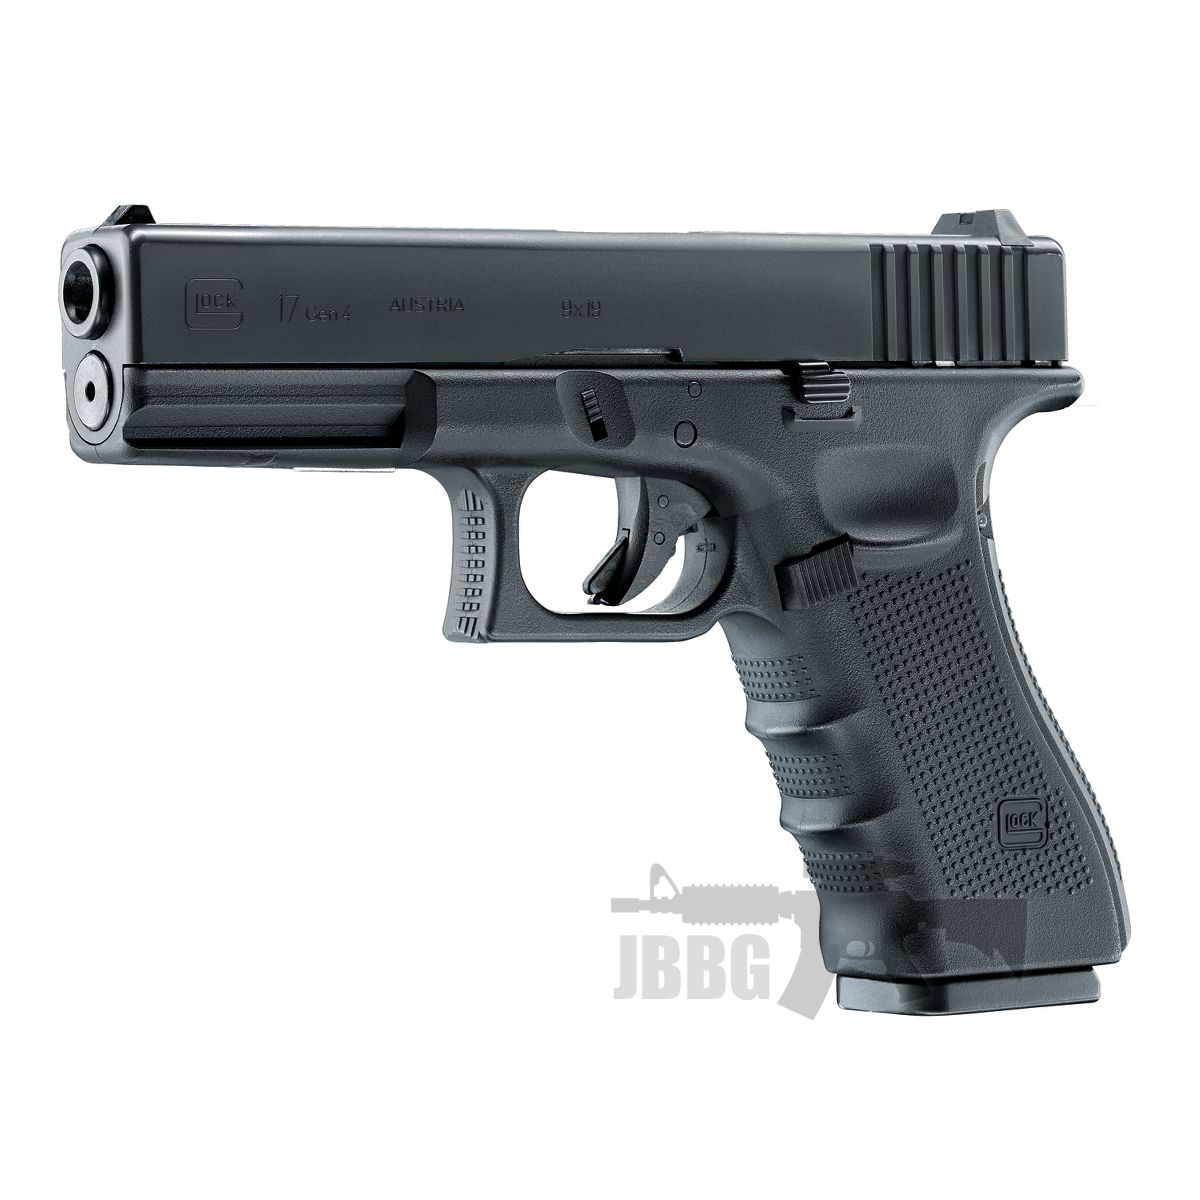 Glock G17 Gen 4 .177 Co2 Airgun Pistol 4.5 Mm Steel Bb